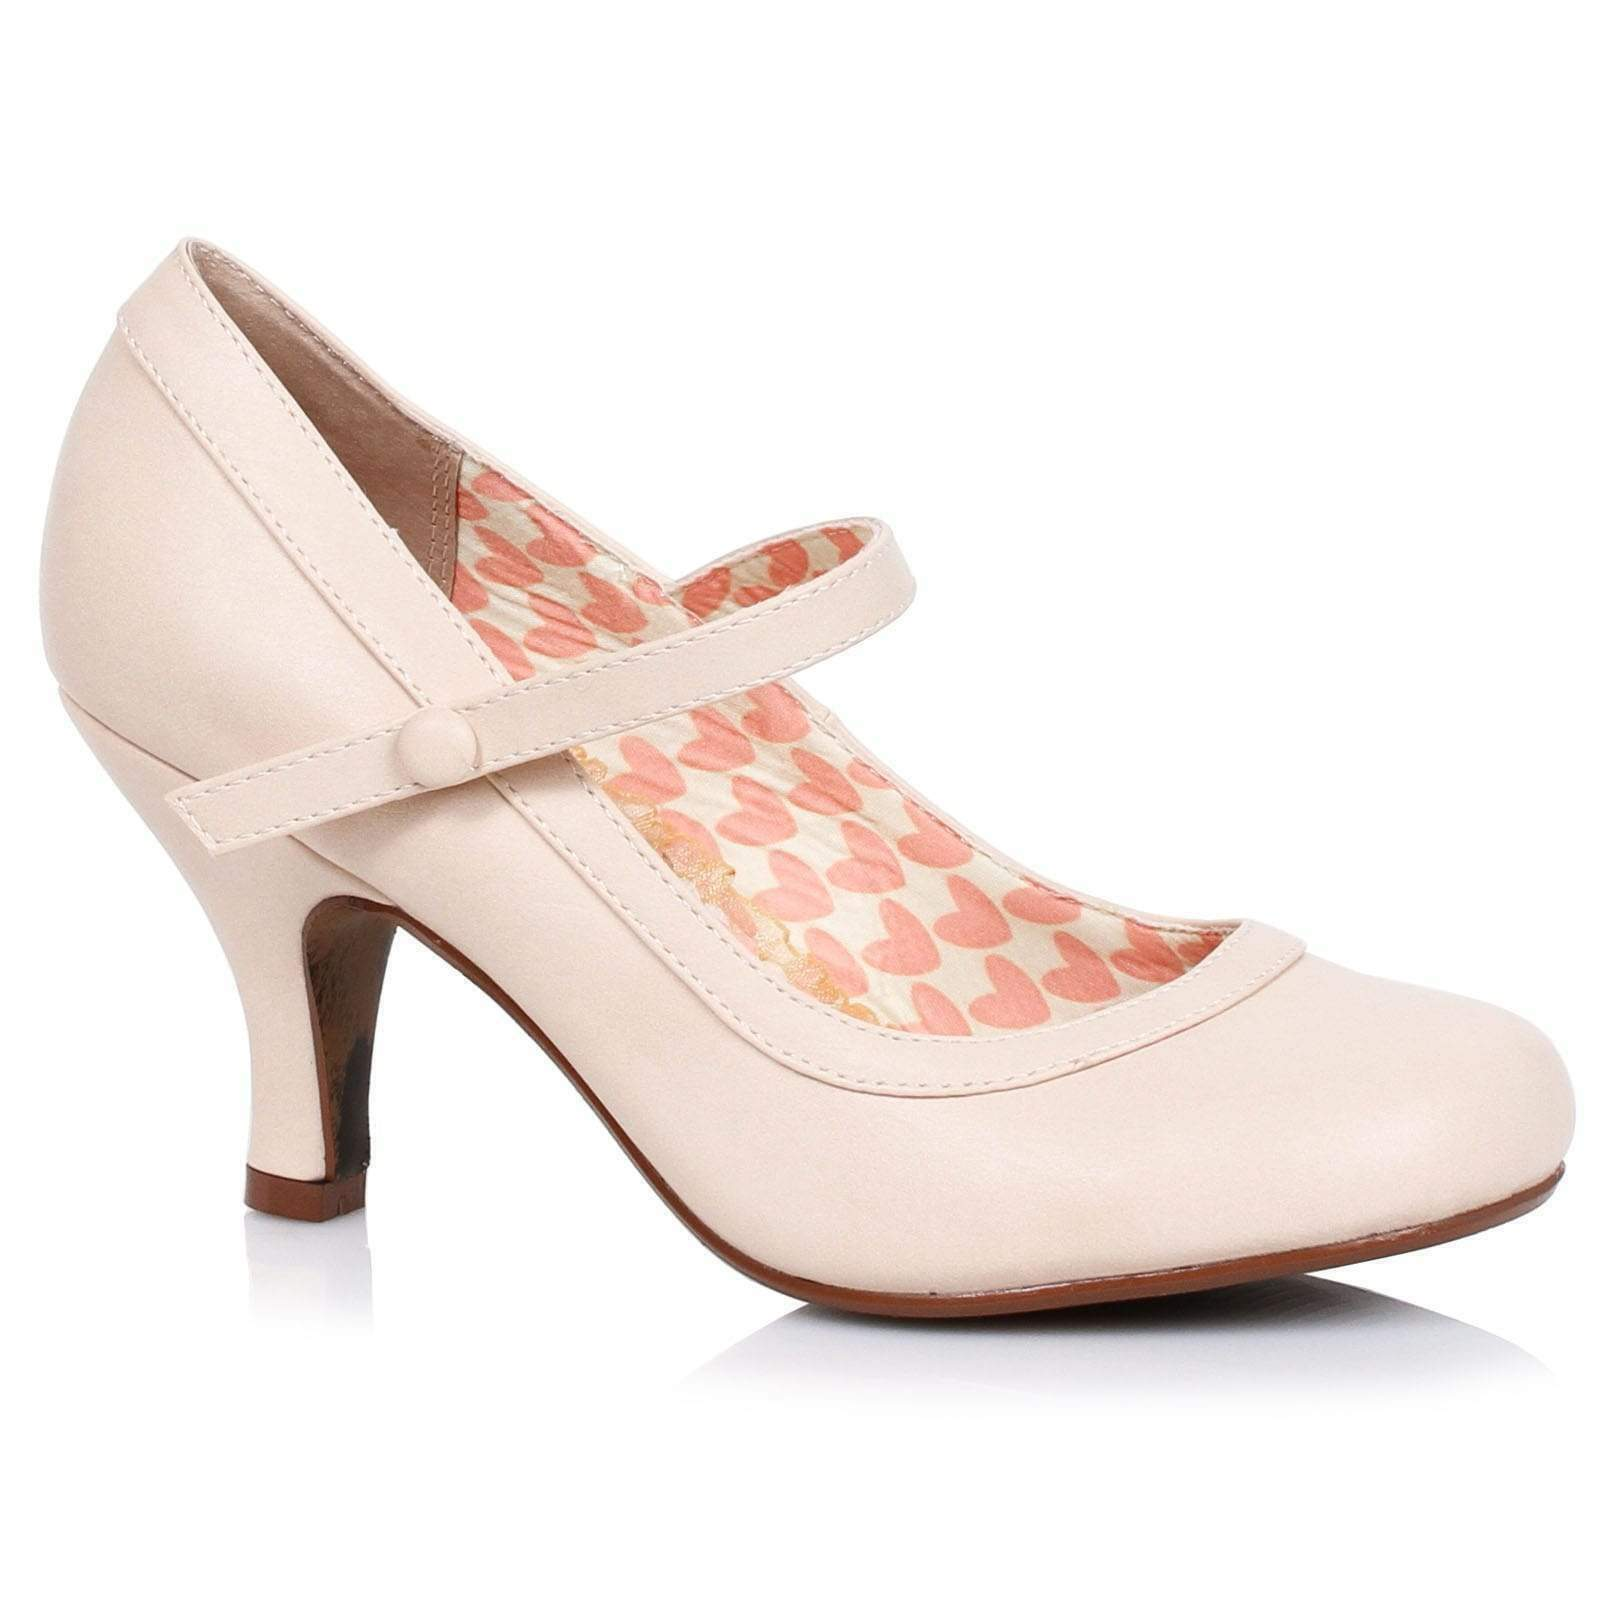 Bettie Page Bettie Mary Jane shoes - Nude - Vintage Retro Rockabilly 50s 5-11